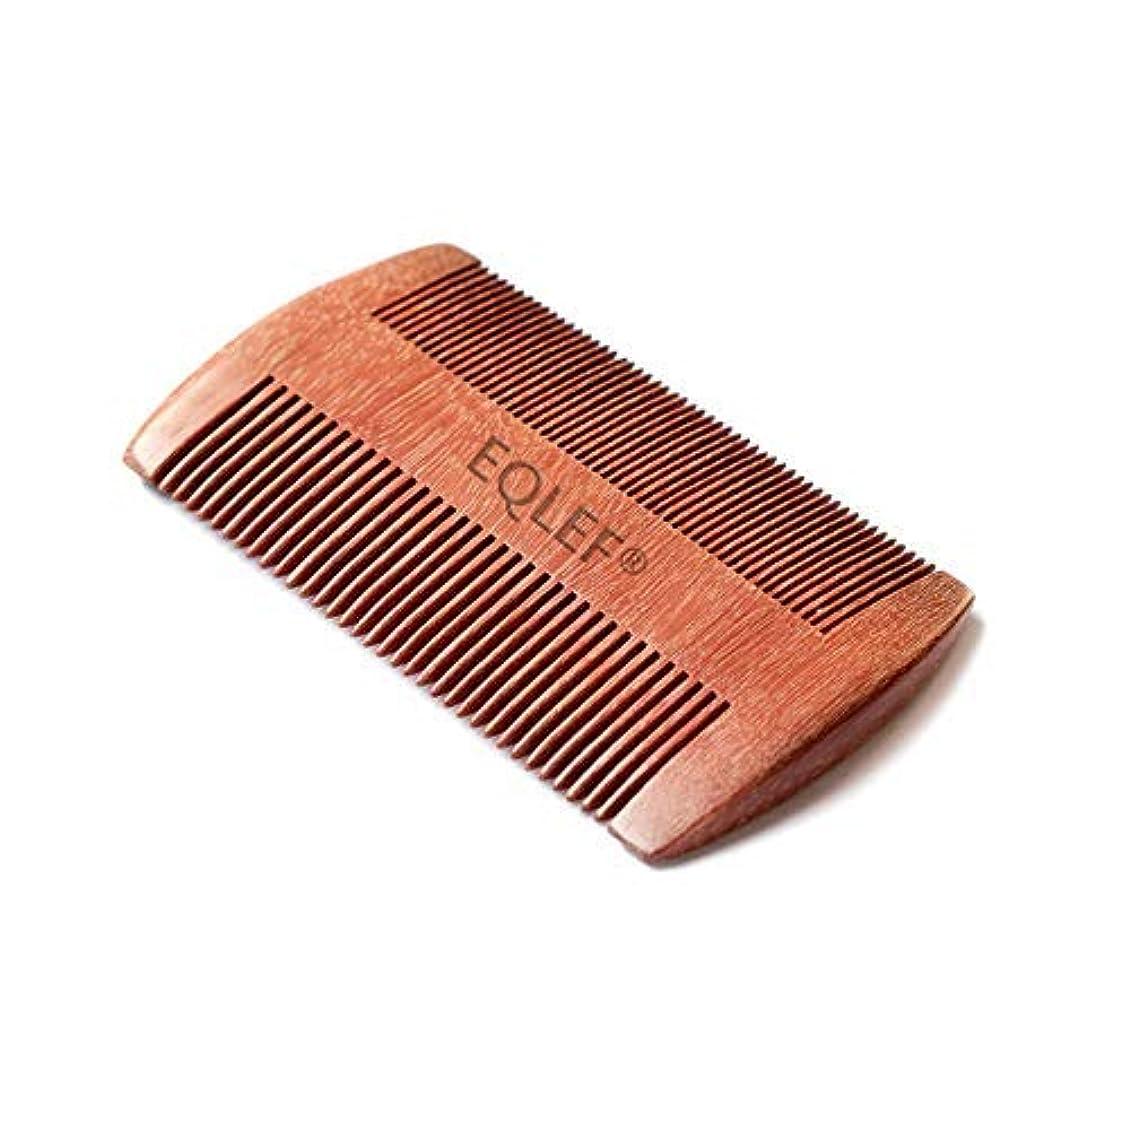 EQLEF? Red sandalwood no static handmade comb, Pocket comb (beard) [並行輸入品]